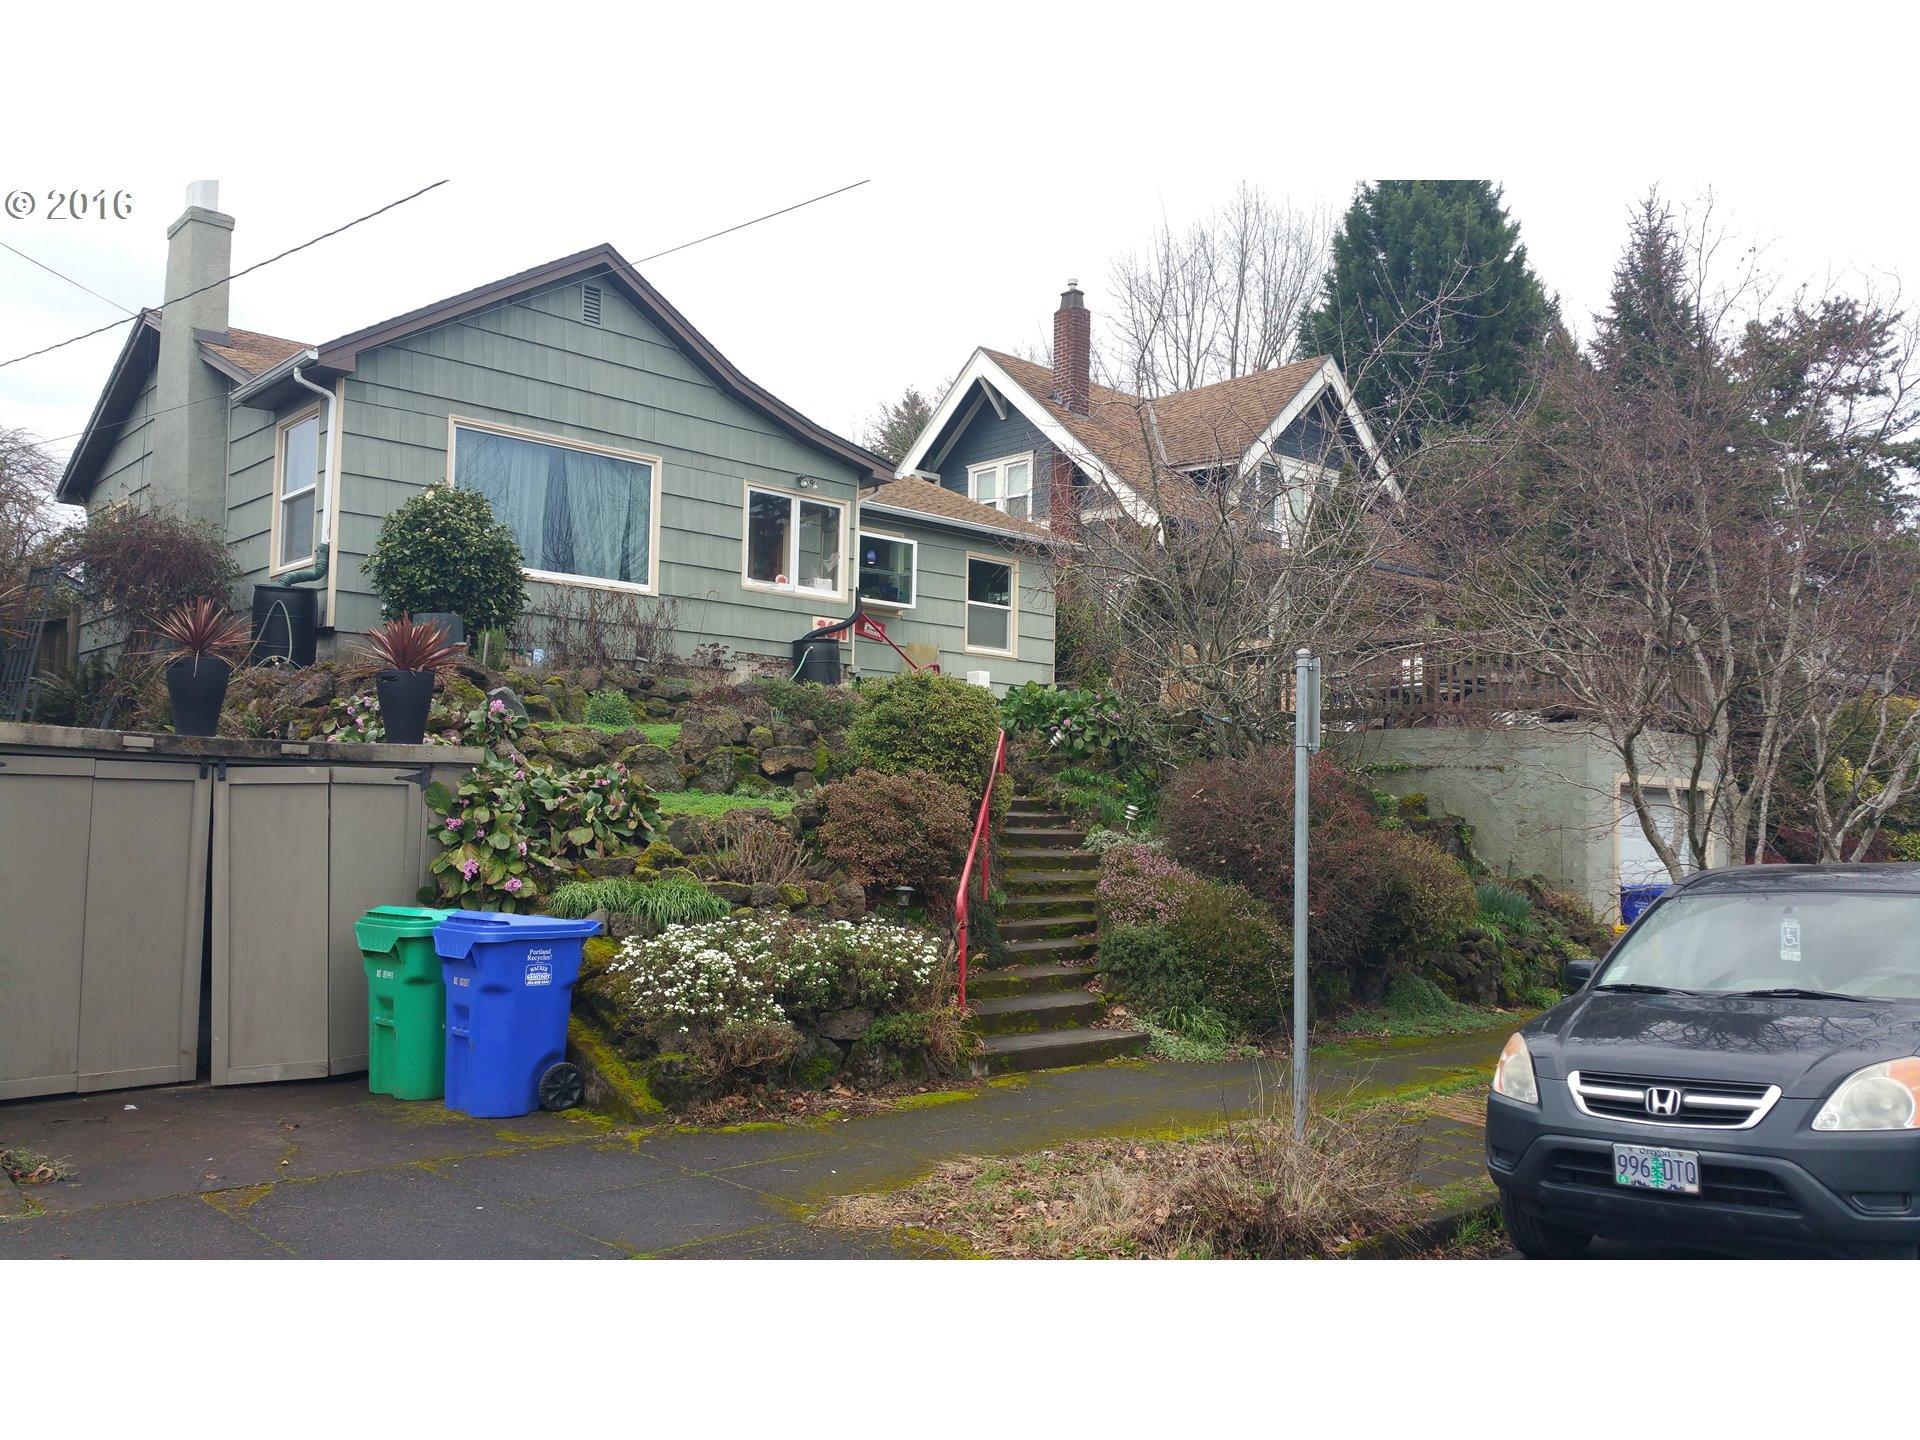 2611 N Sumner St, Portland, OR